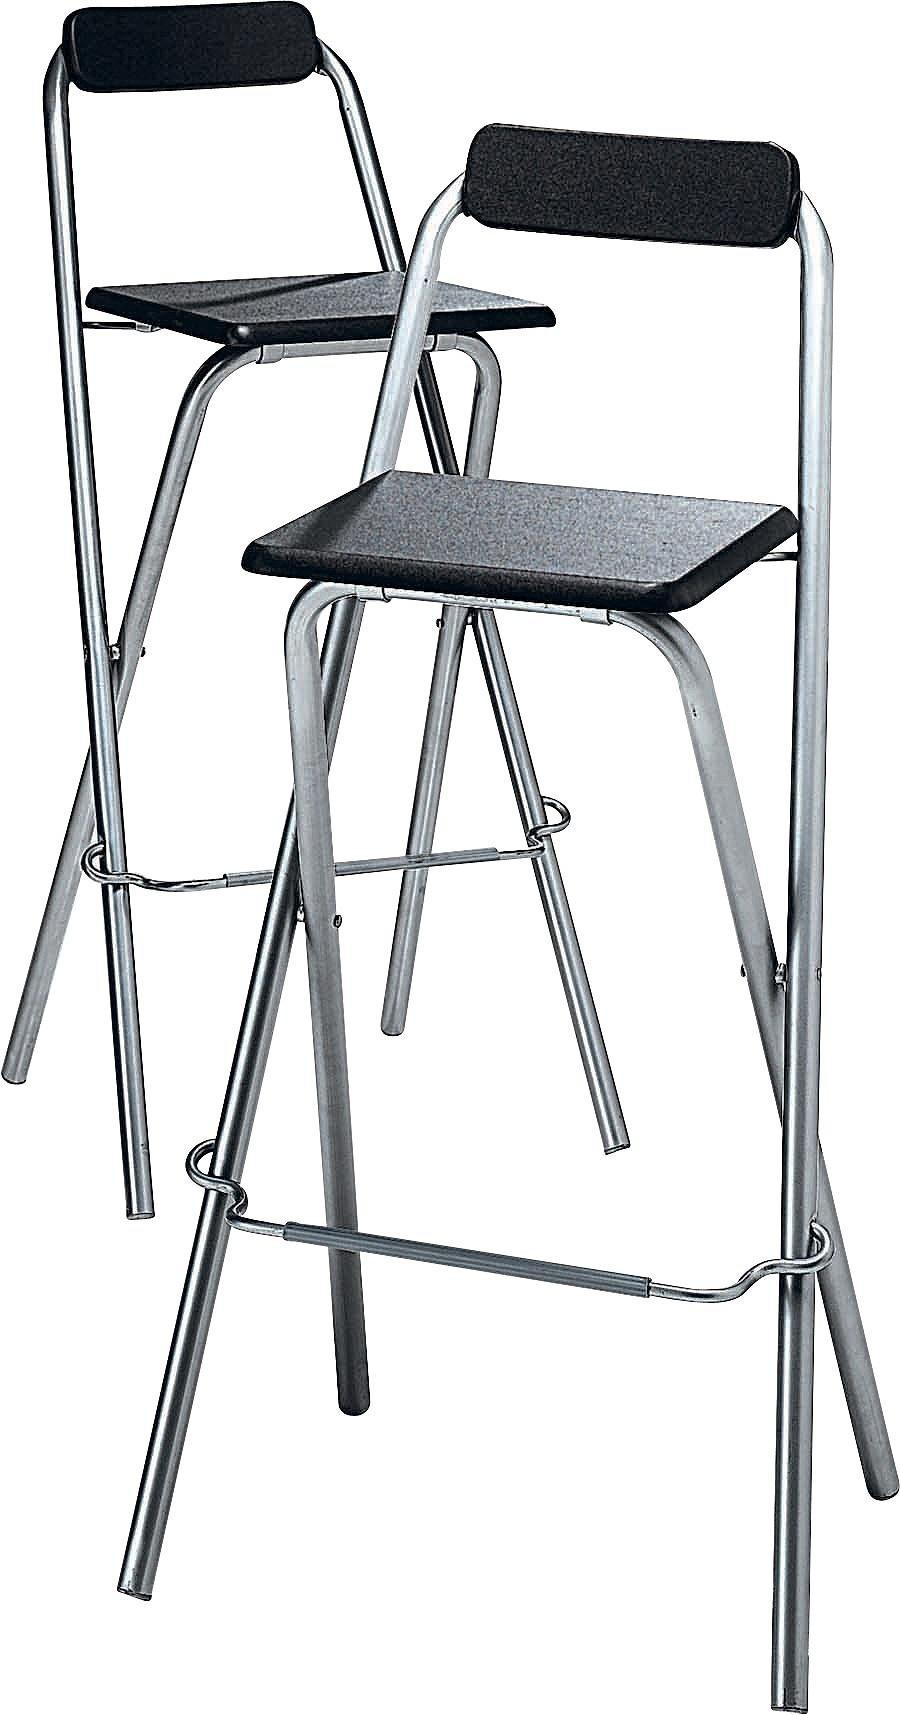 Buy Argos Home Theo Pair Of Folding Bar Stools | Bar Stools | Argos